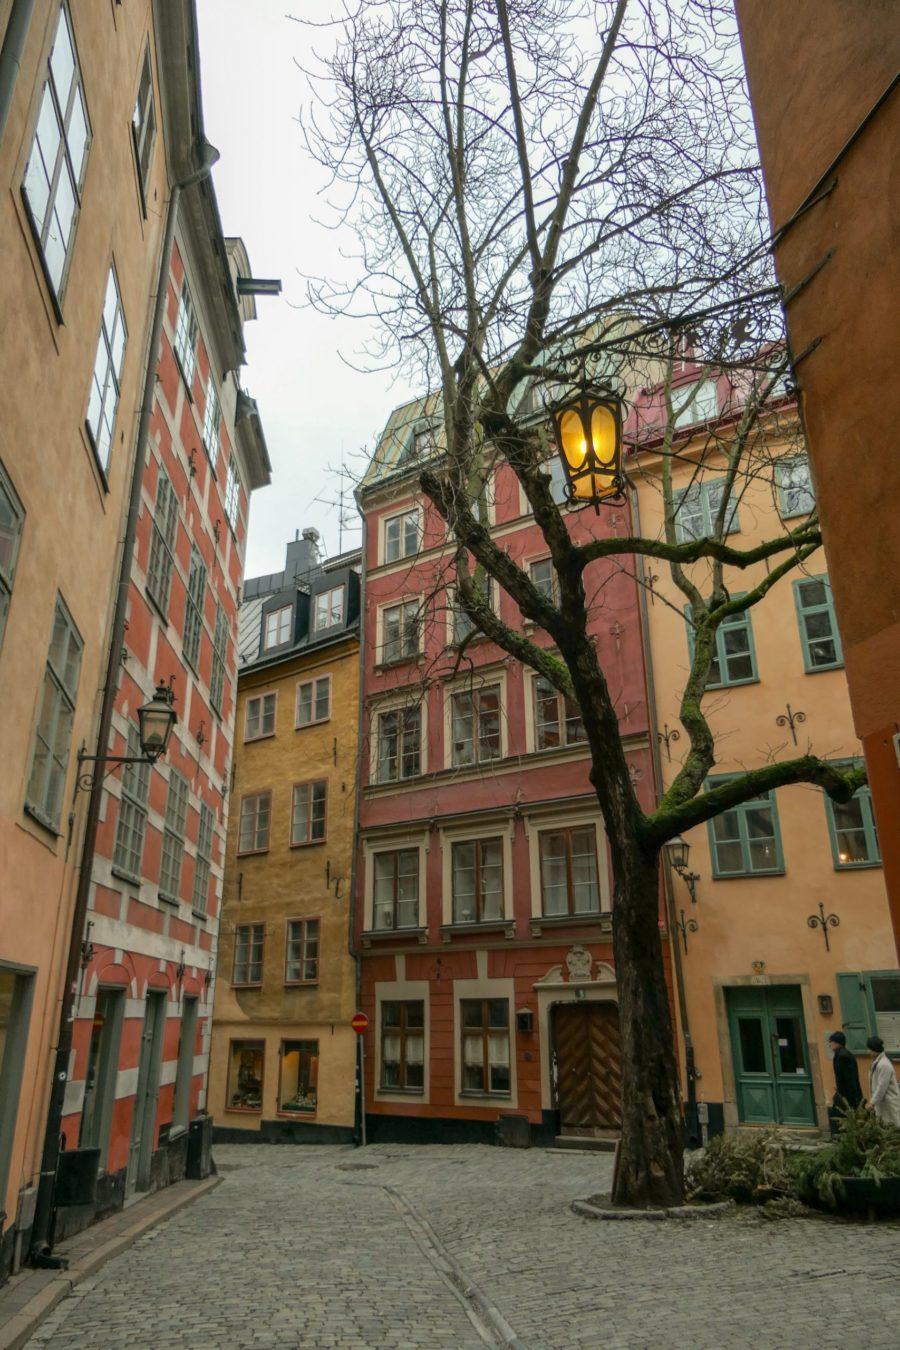 Stockholm Schweden Gamla Stan Stadsholmen Altstadt Gasse Kindstugatan